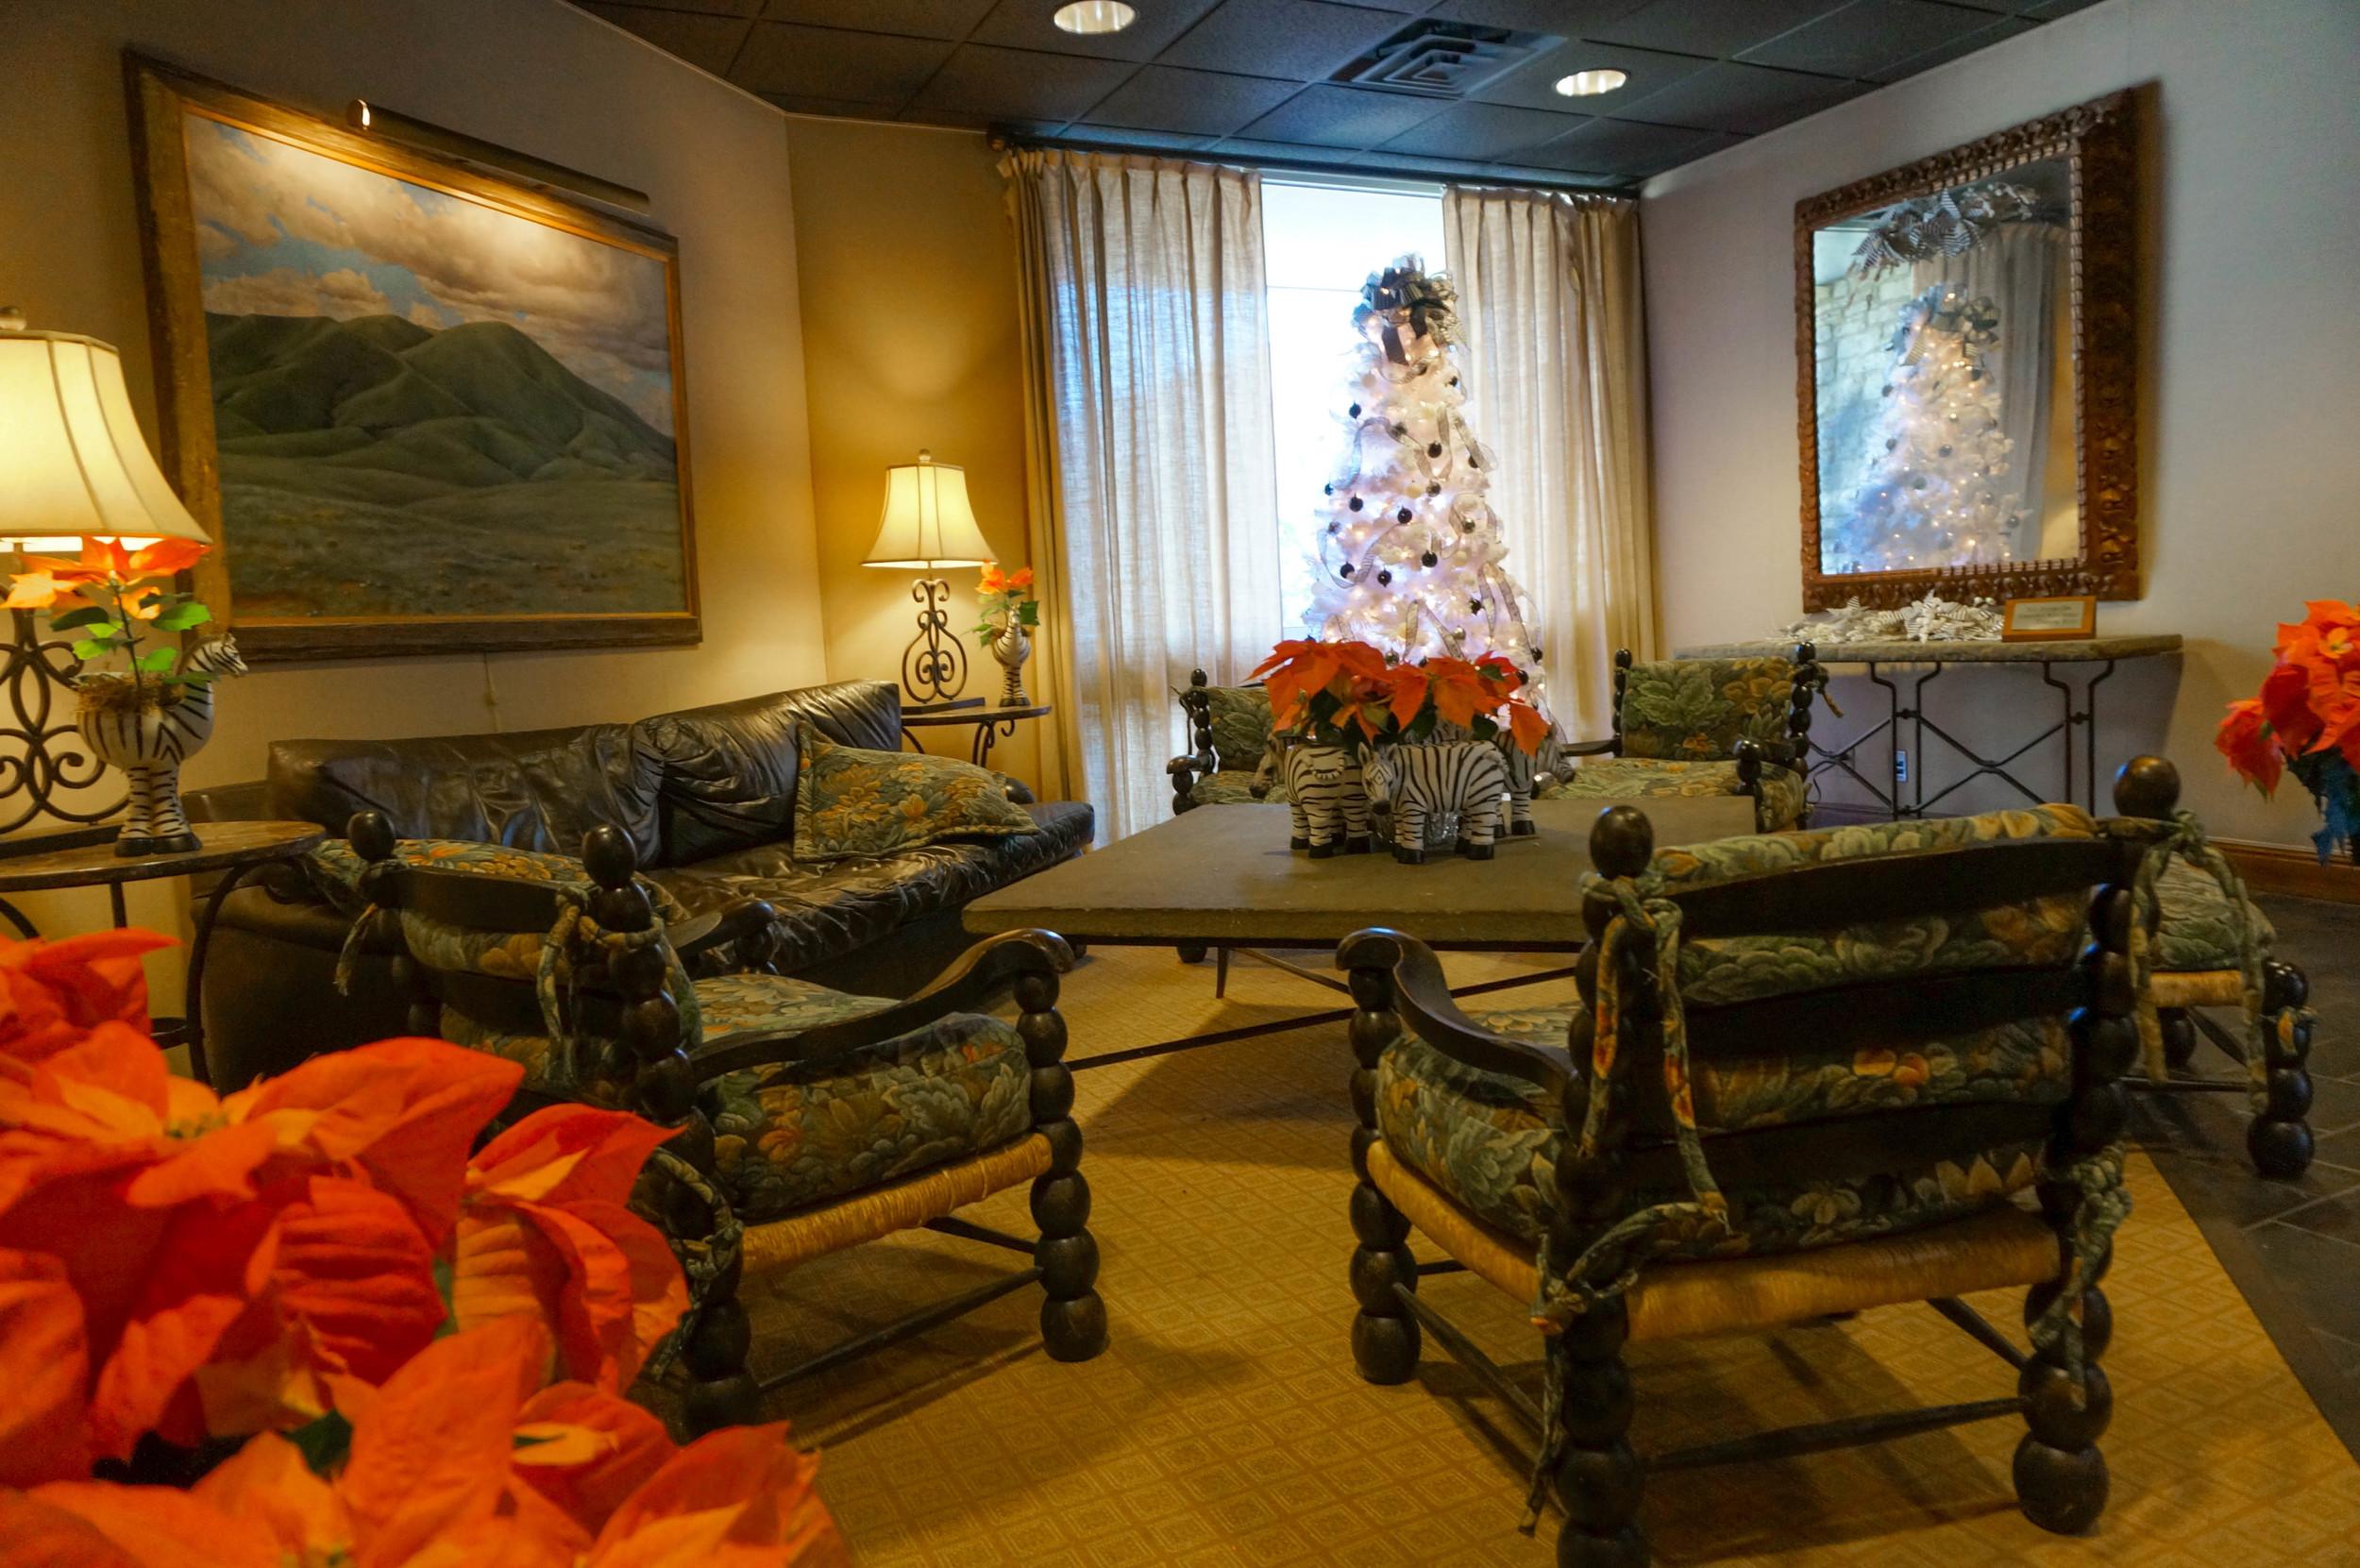 VIP Room in the Garden Center